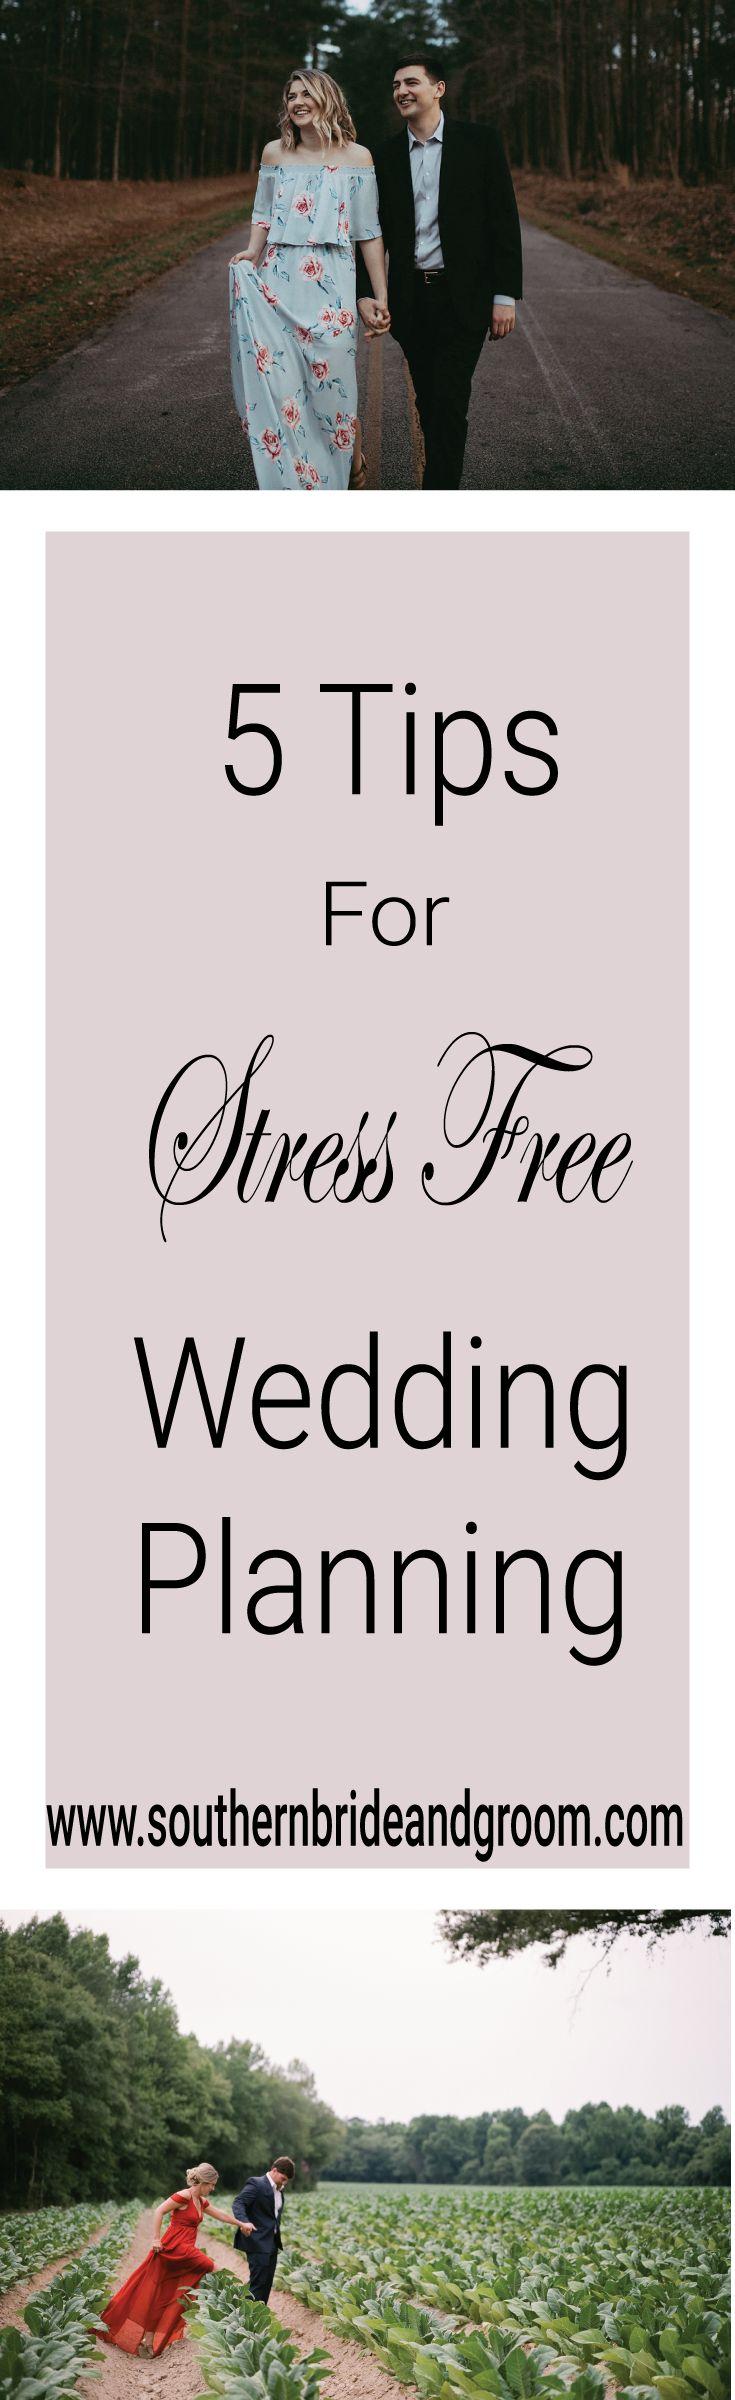 best wedding planning stress on relationship